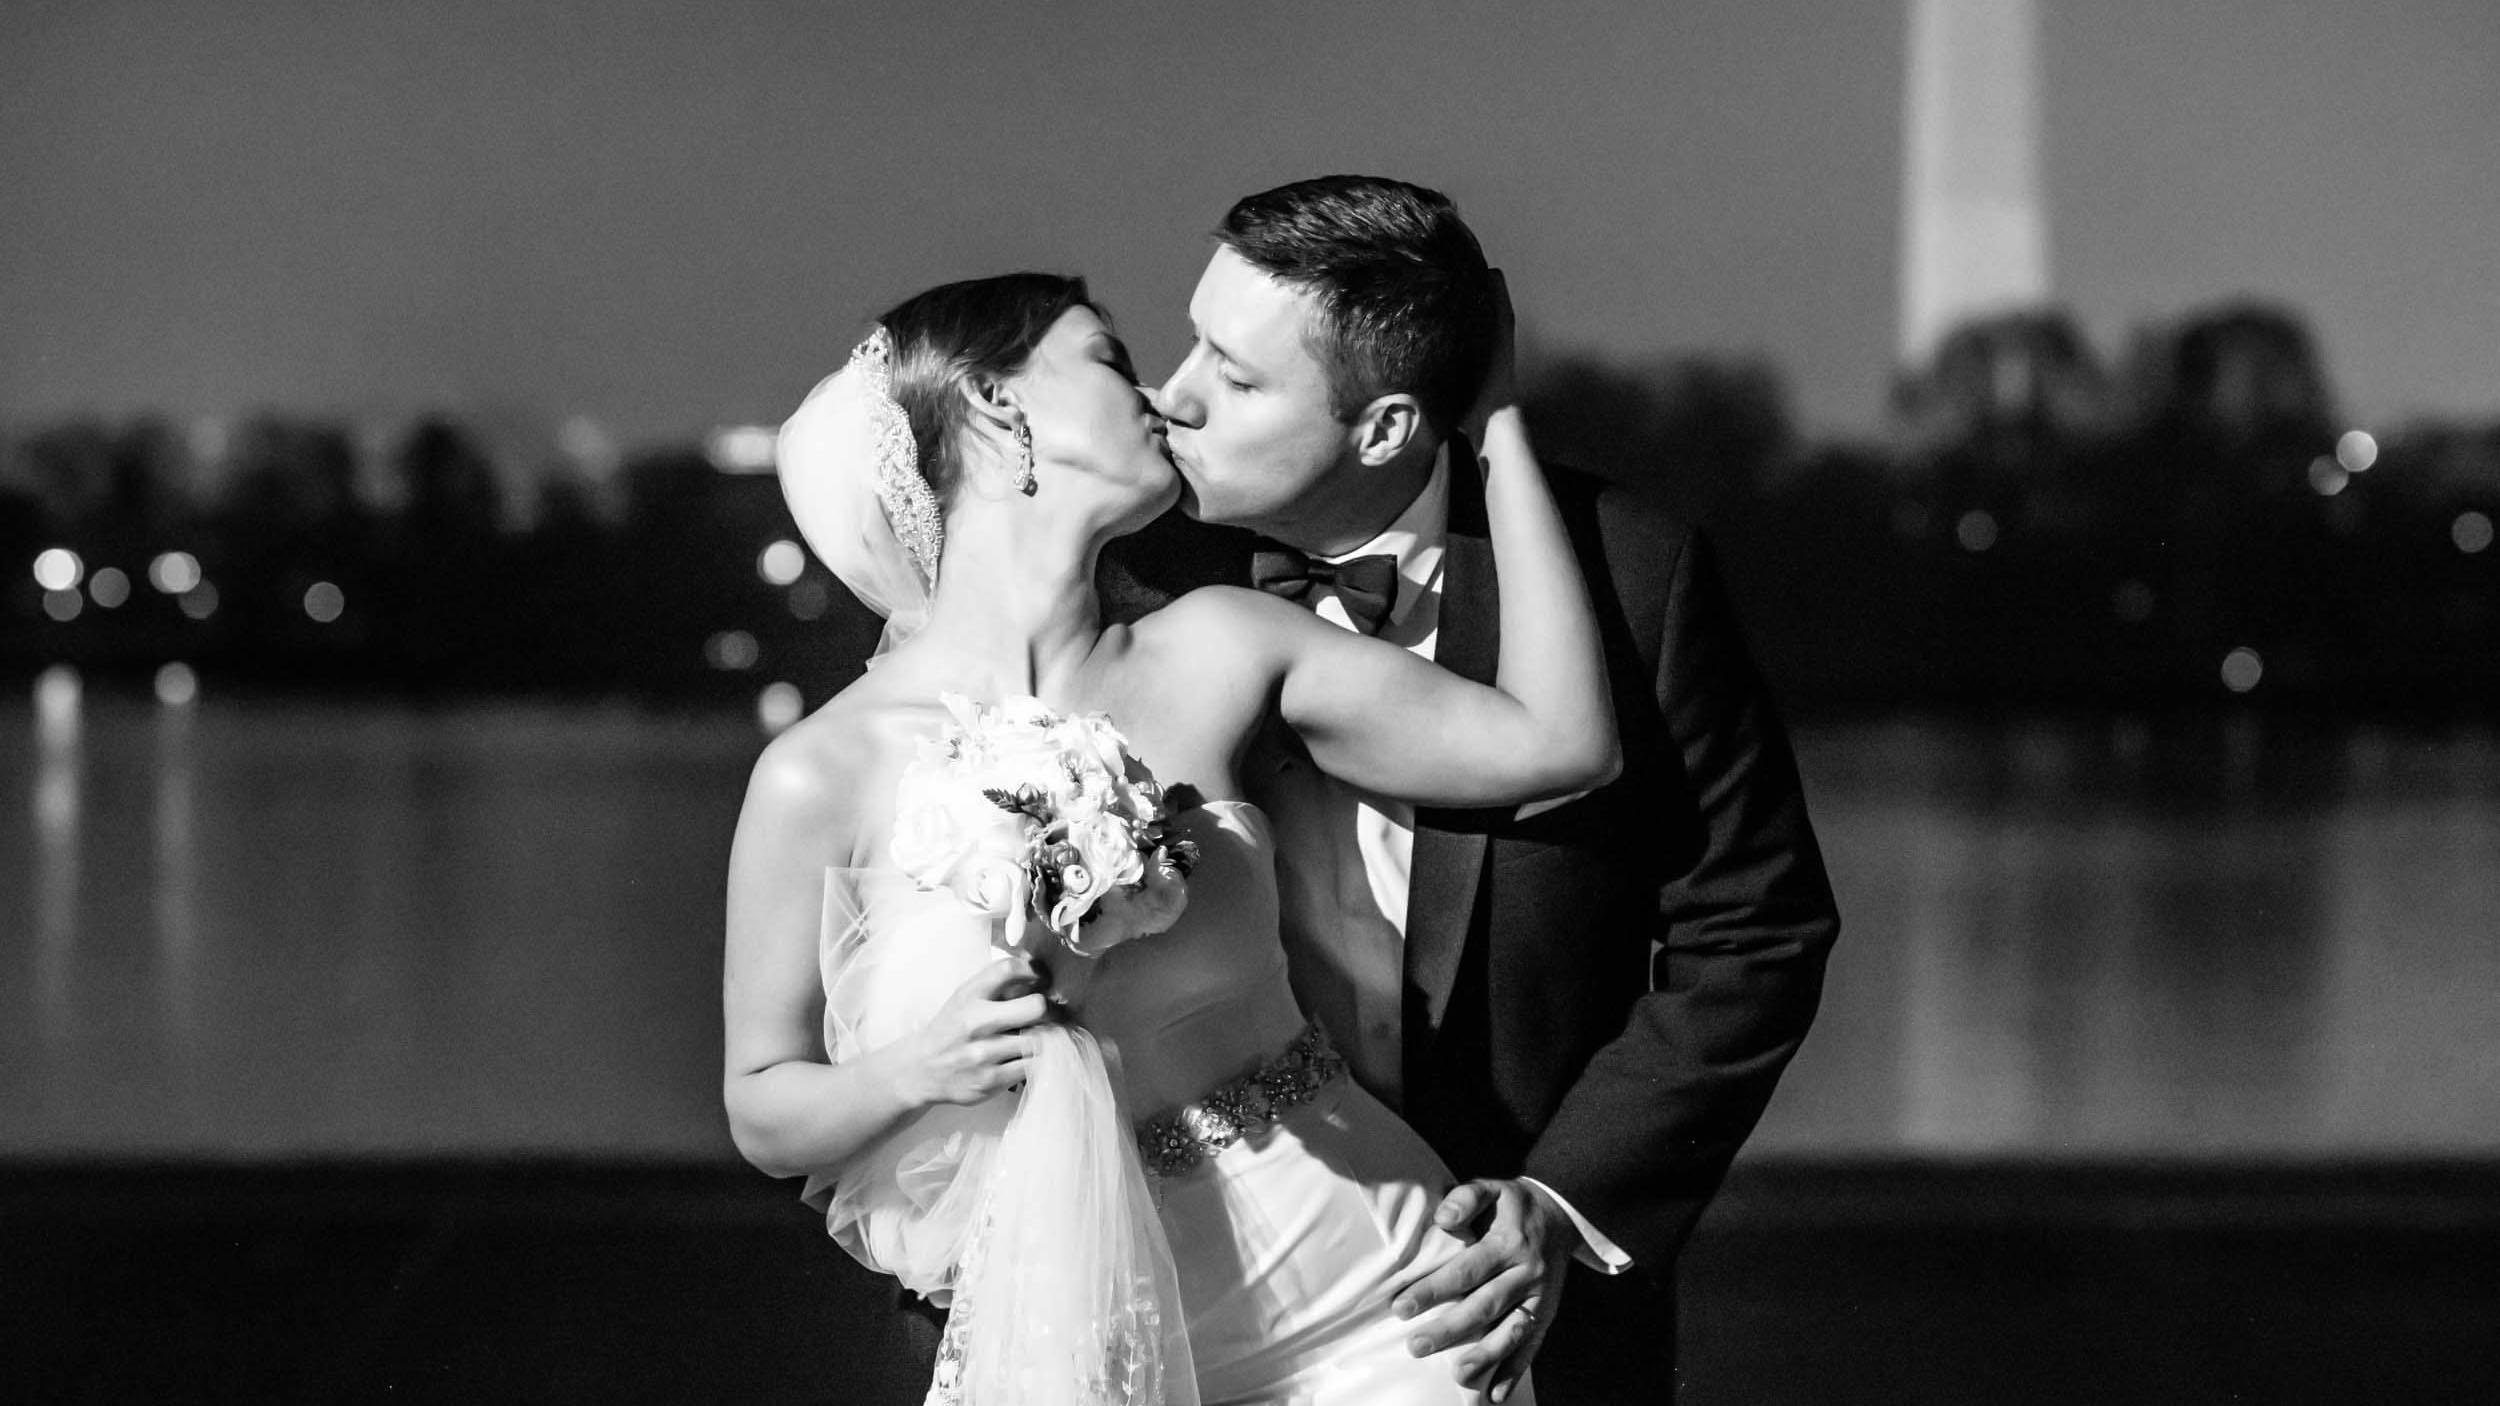 dc+metro+wedding+photographer+vadym+guliuk+photography+wedding+bride+and+groom-2021.jpg